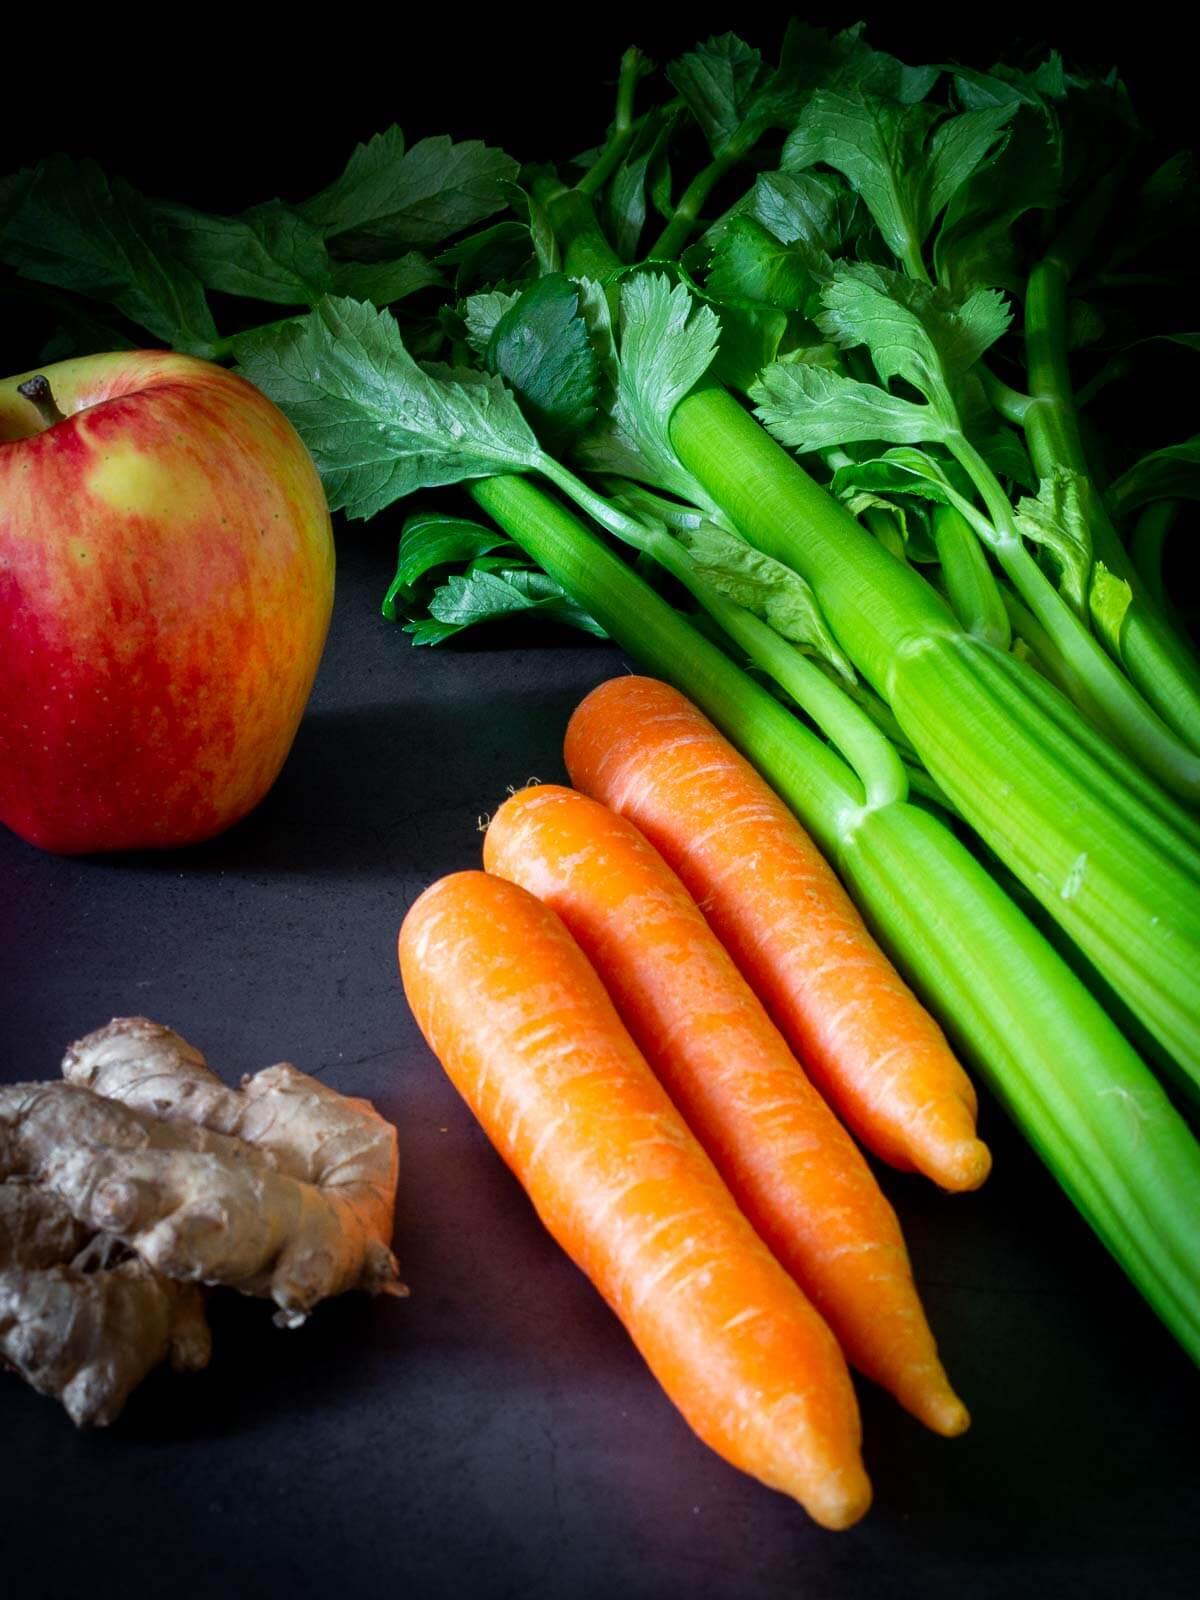 Carrot Juice Ingredients